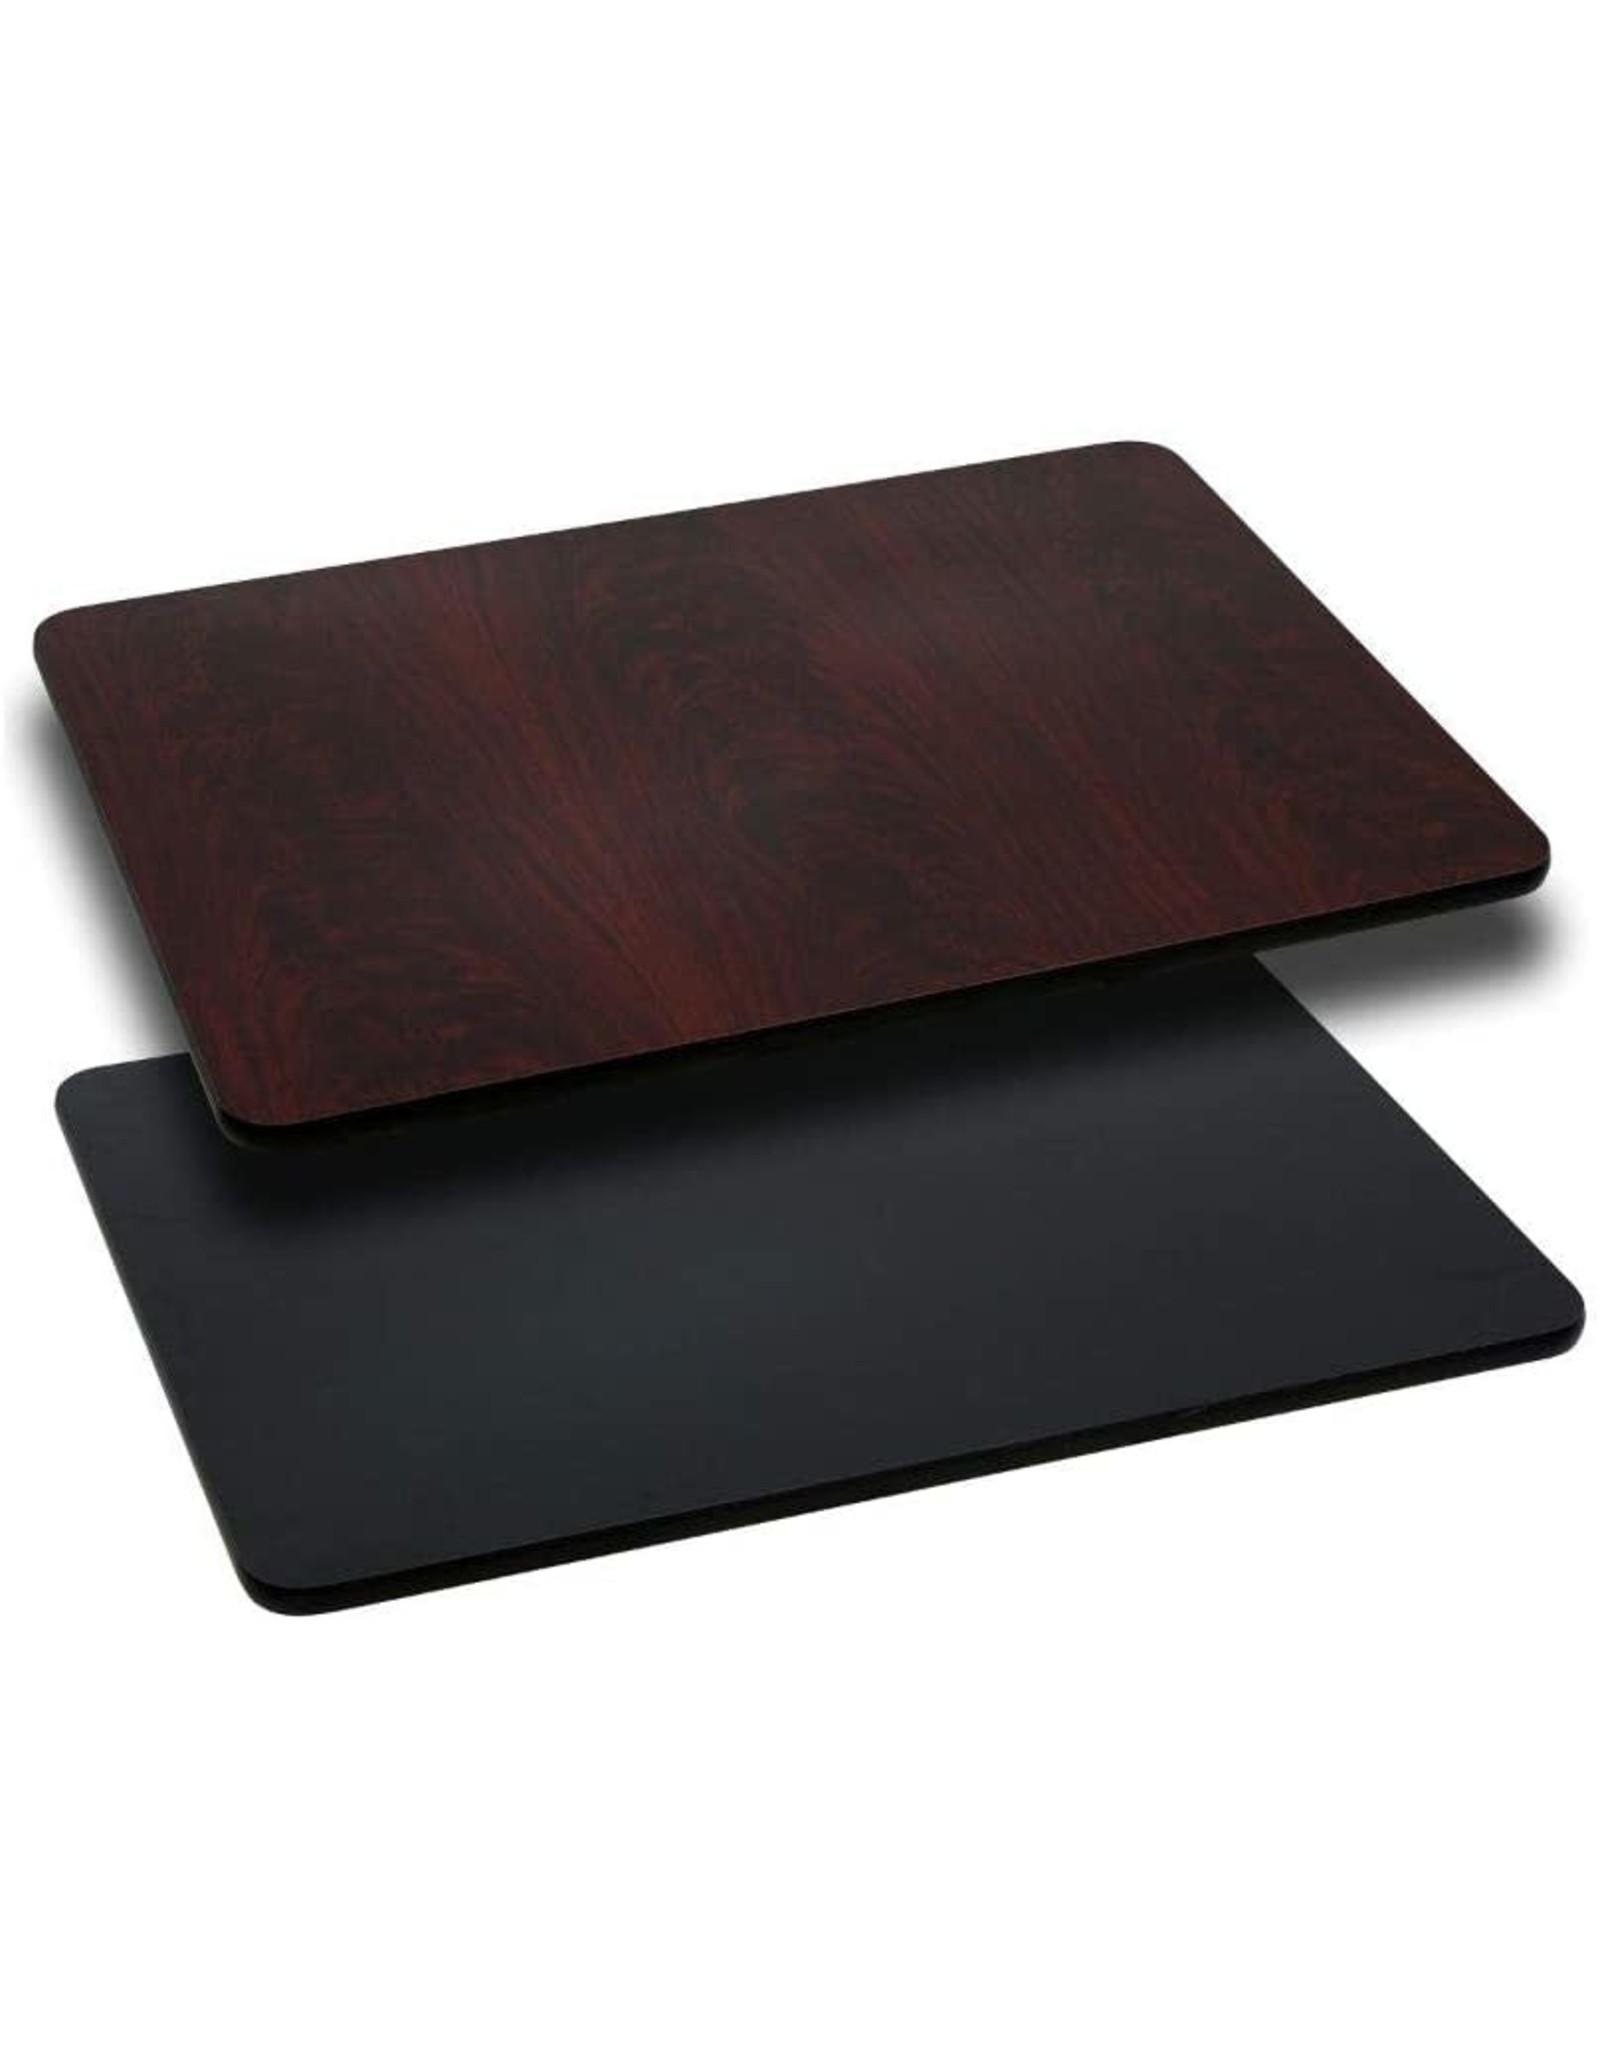 Flash Furniture Flash Furniture 24'' x 42'' Rectangular Table Top with Black or Mahogany Reversible Laminate Top